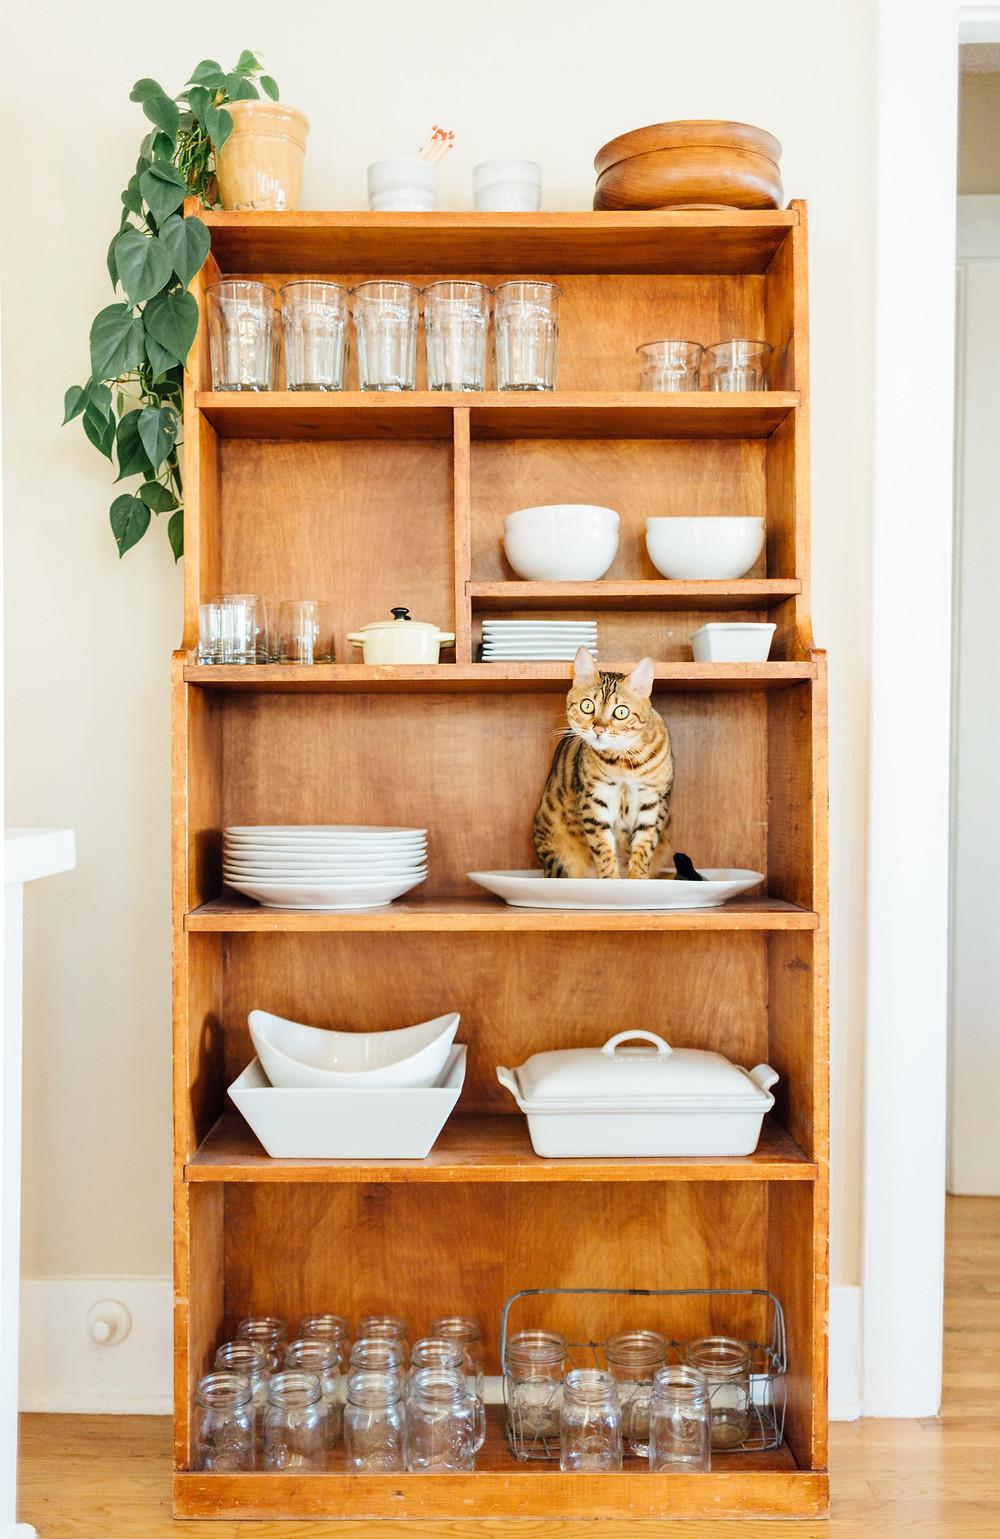 declutter-apartment-shelving-kitchen